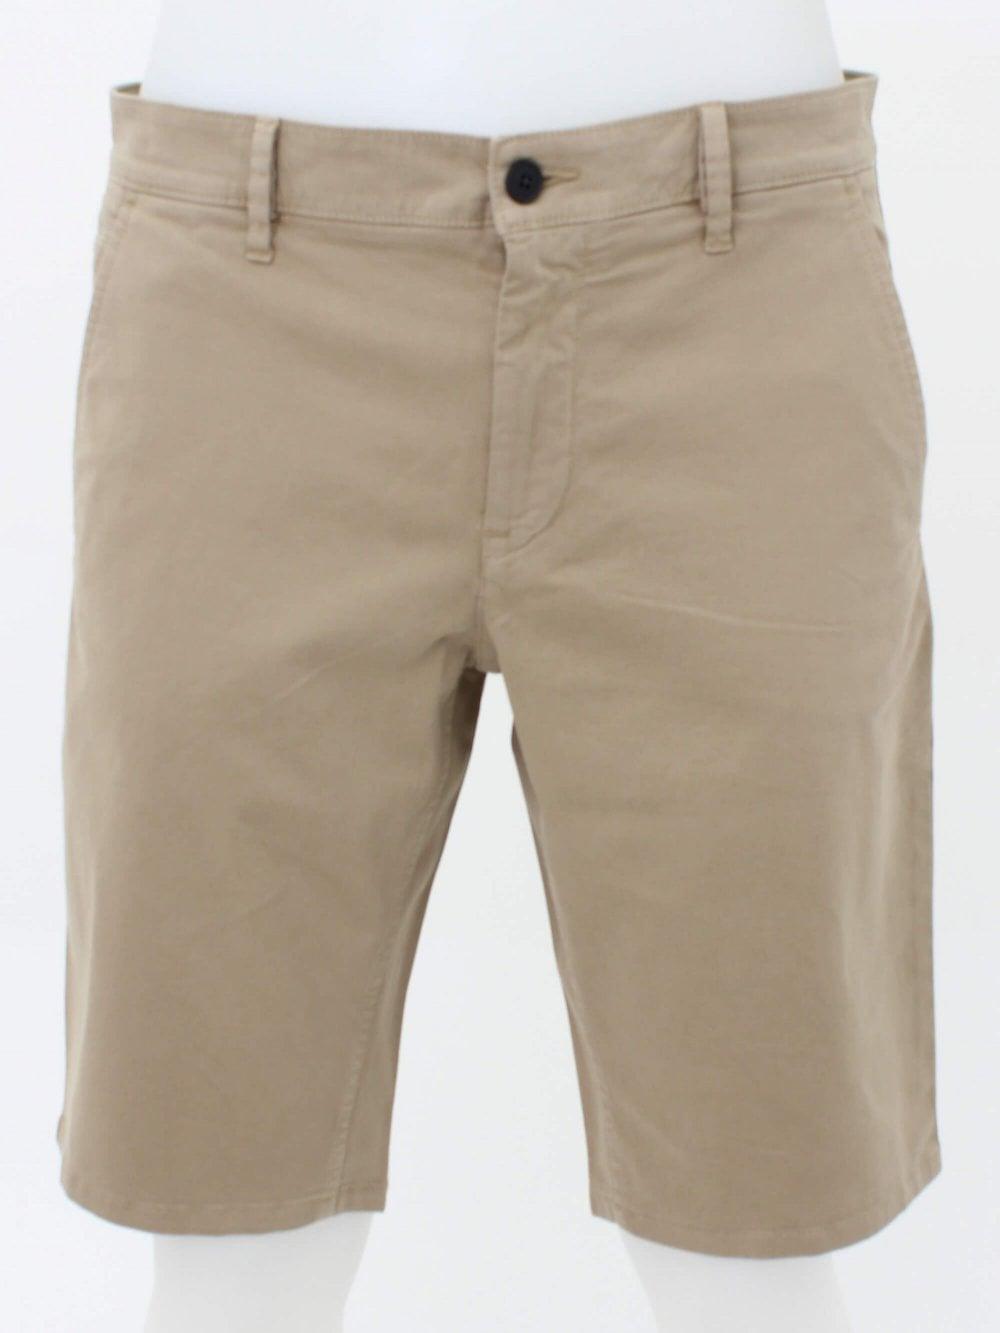 498f1246a Hugo Boss Casual Schino Slim Fit Shorts in Medium Beige | Northern ...